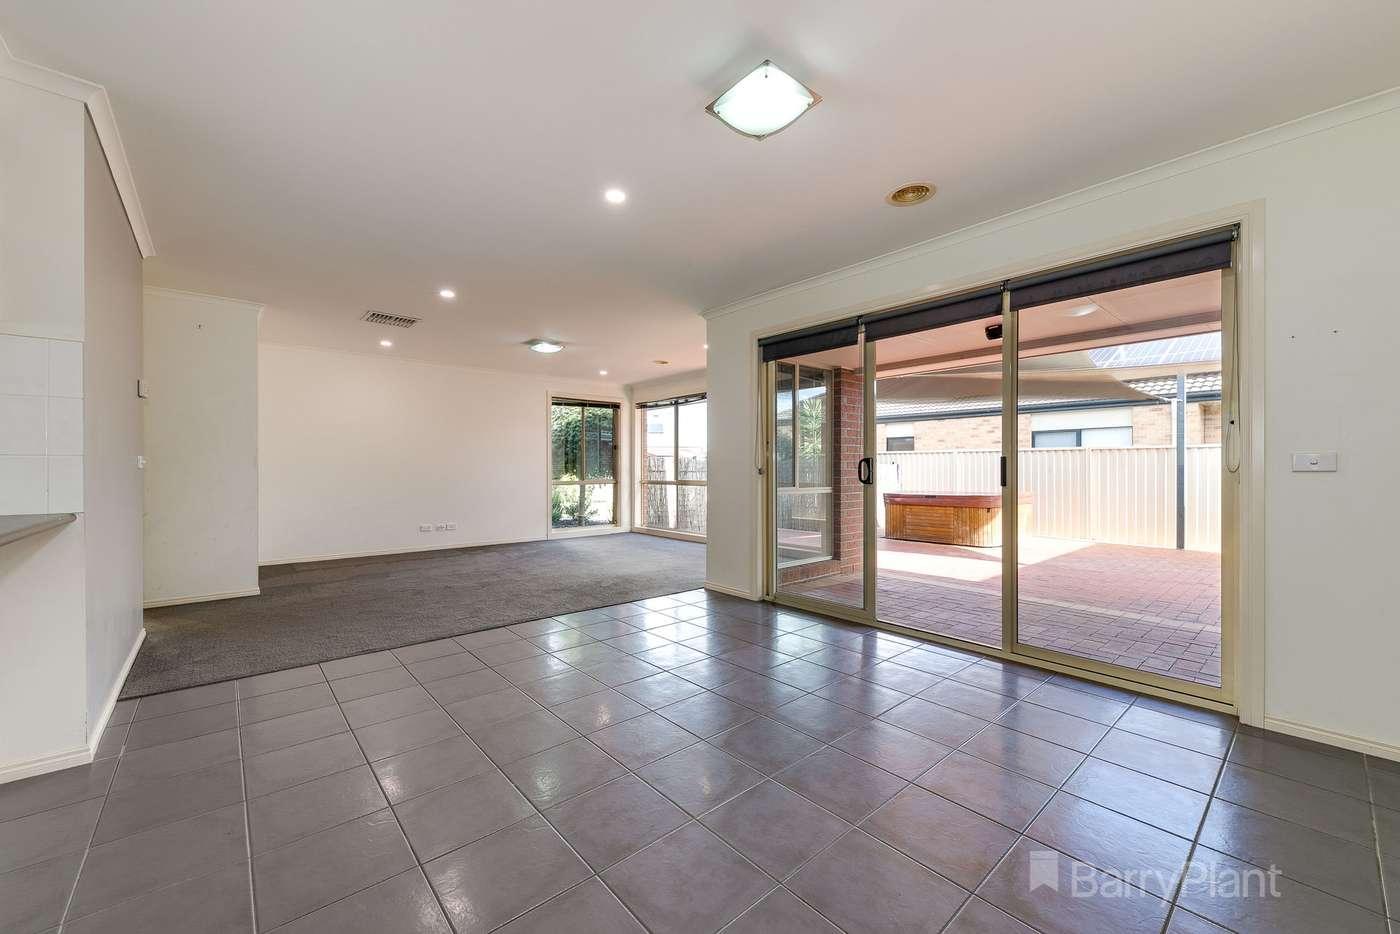 Fifth view of Homely house listing, 9 Lobelia Street, Pakenham VIC 3810